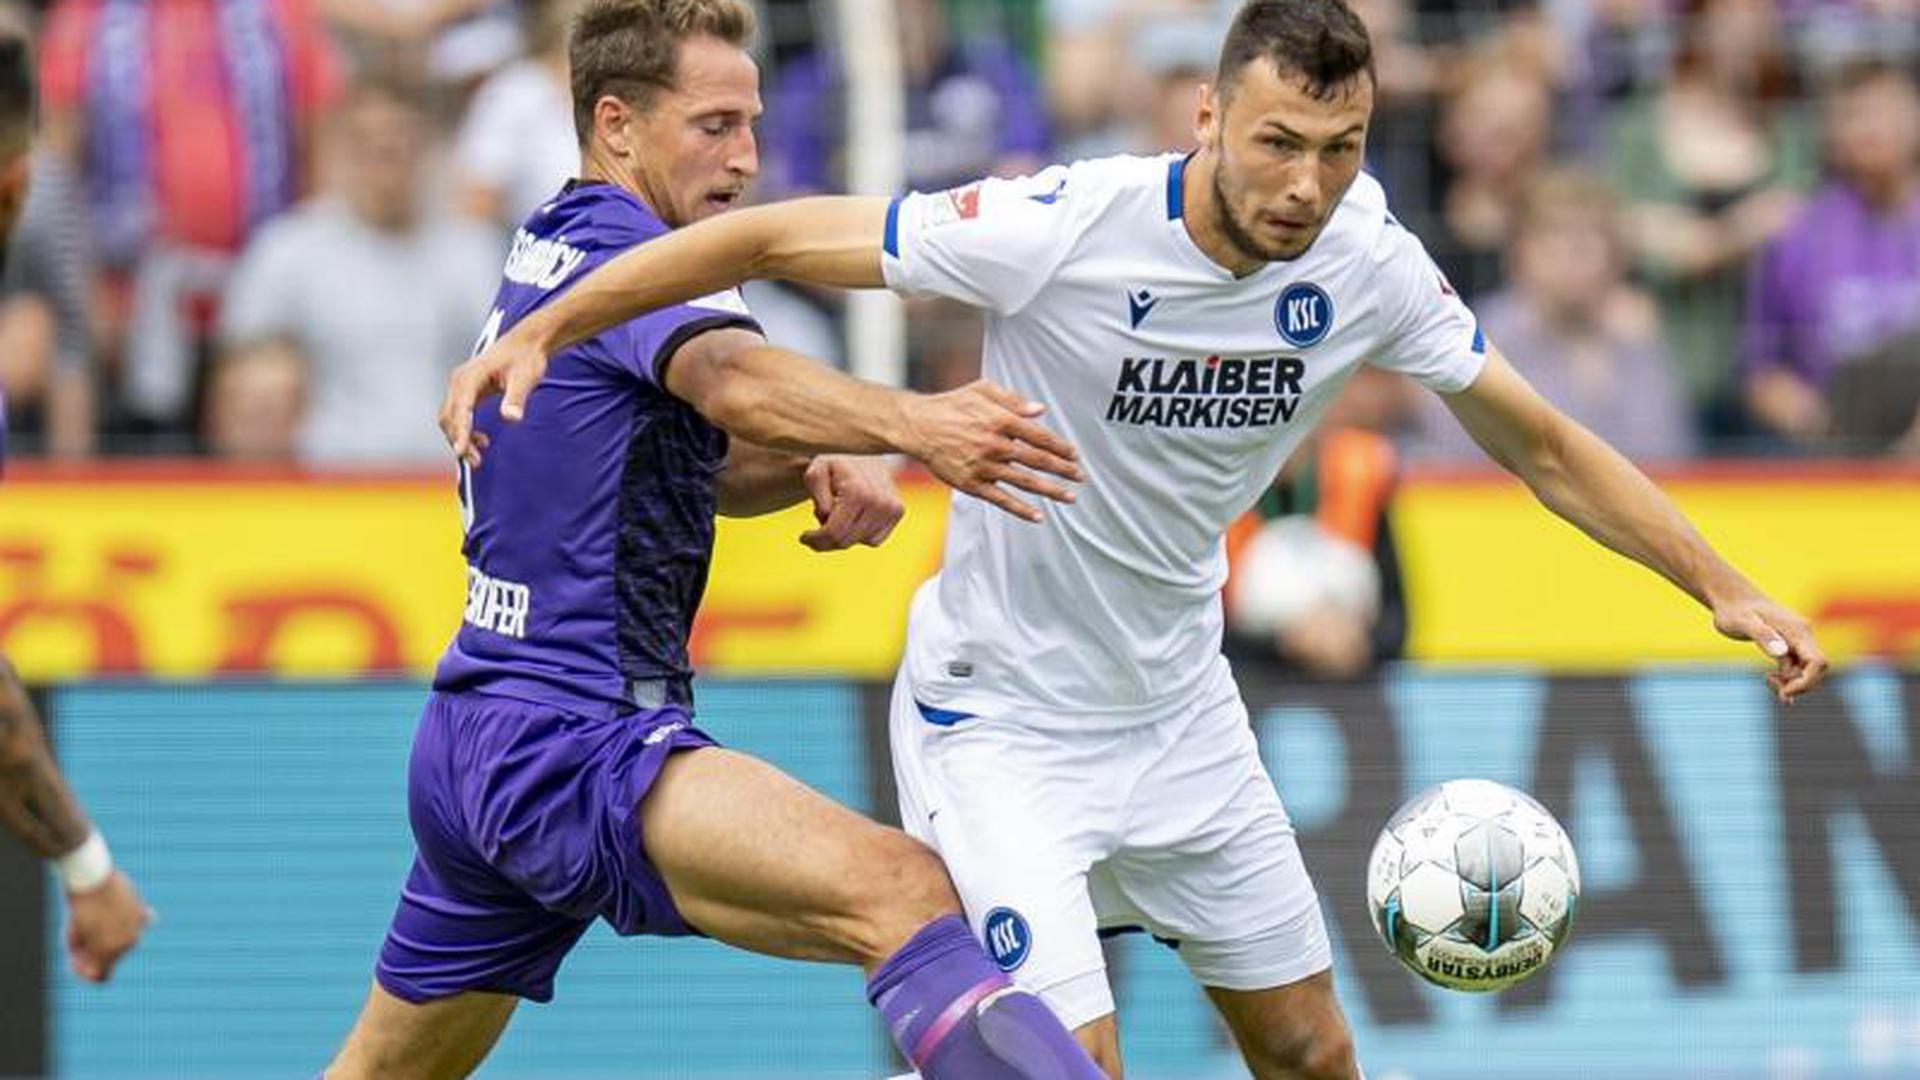 Ulrich Taffertshofer und Lukas Fröde im Kampf um den Ball